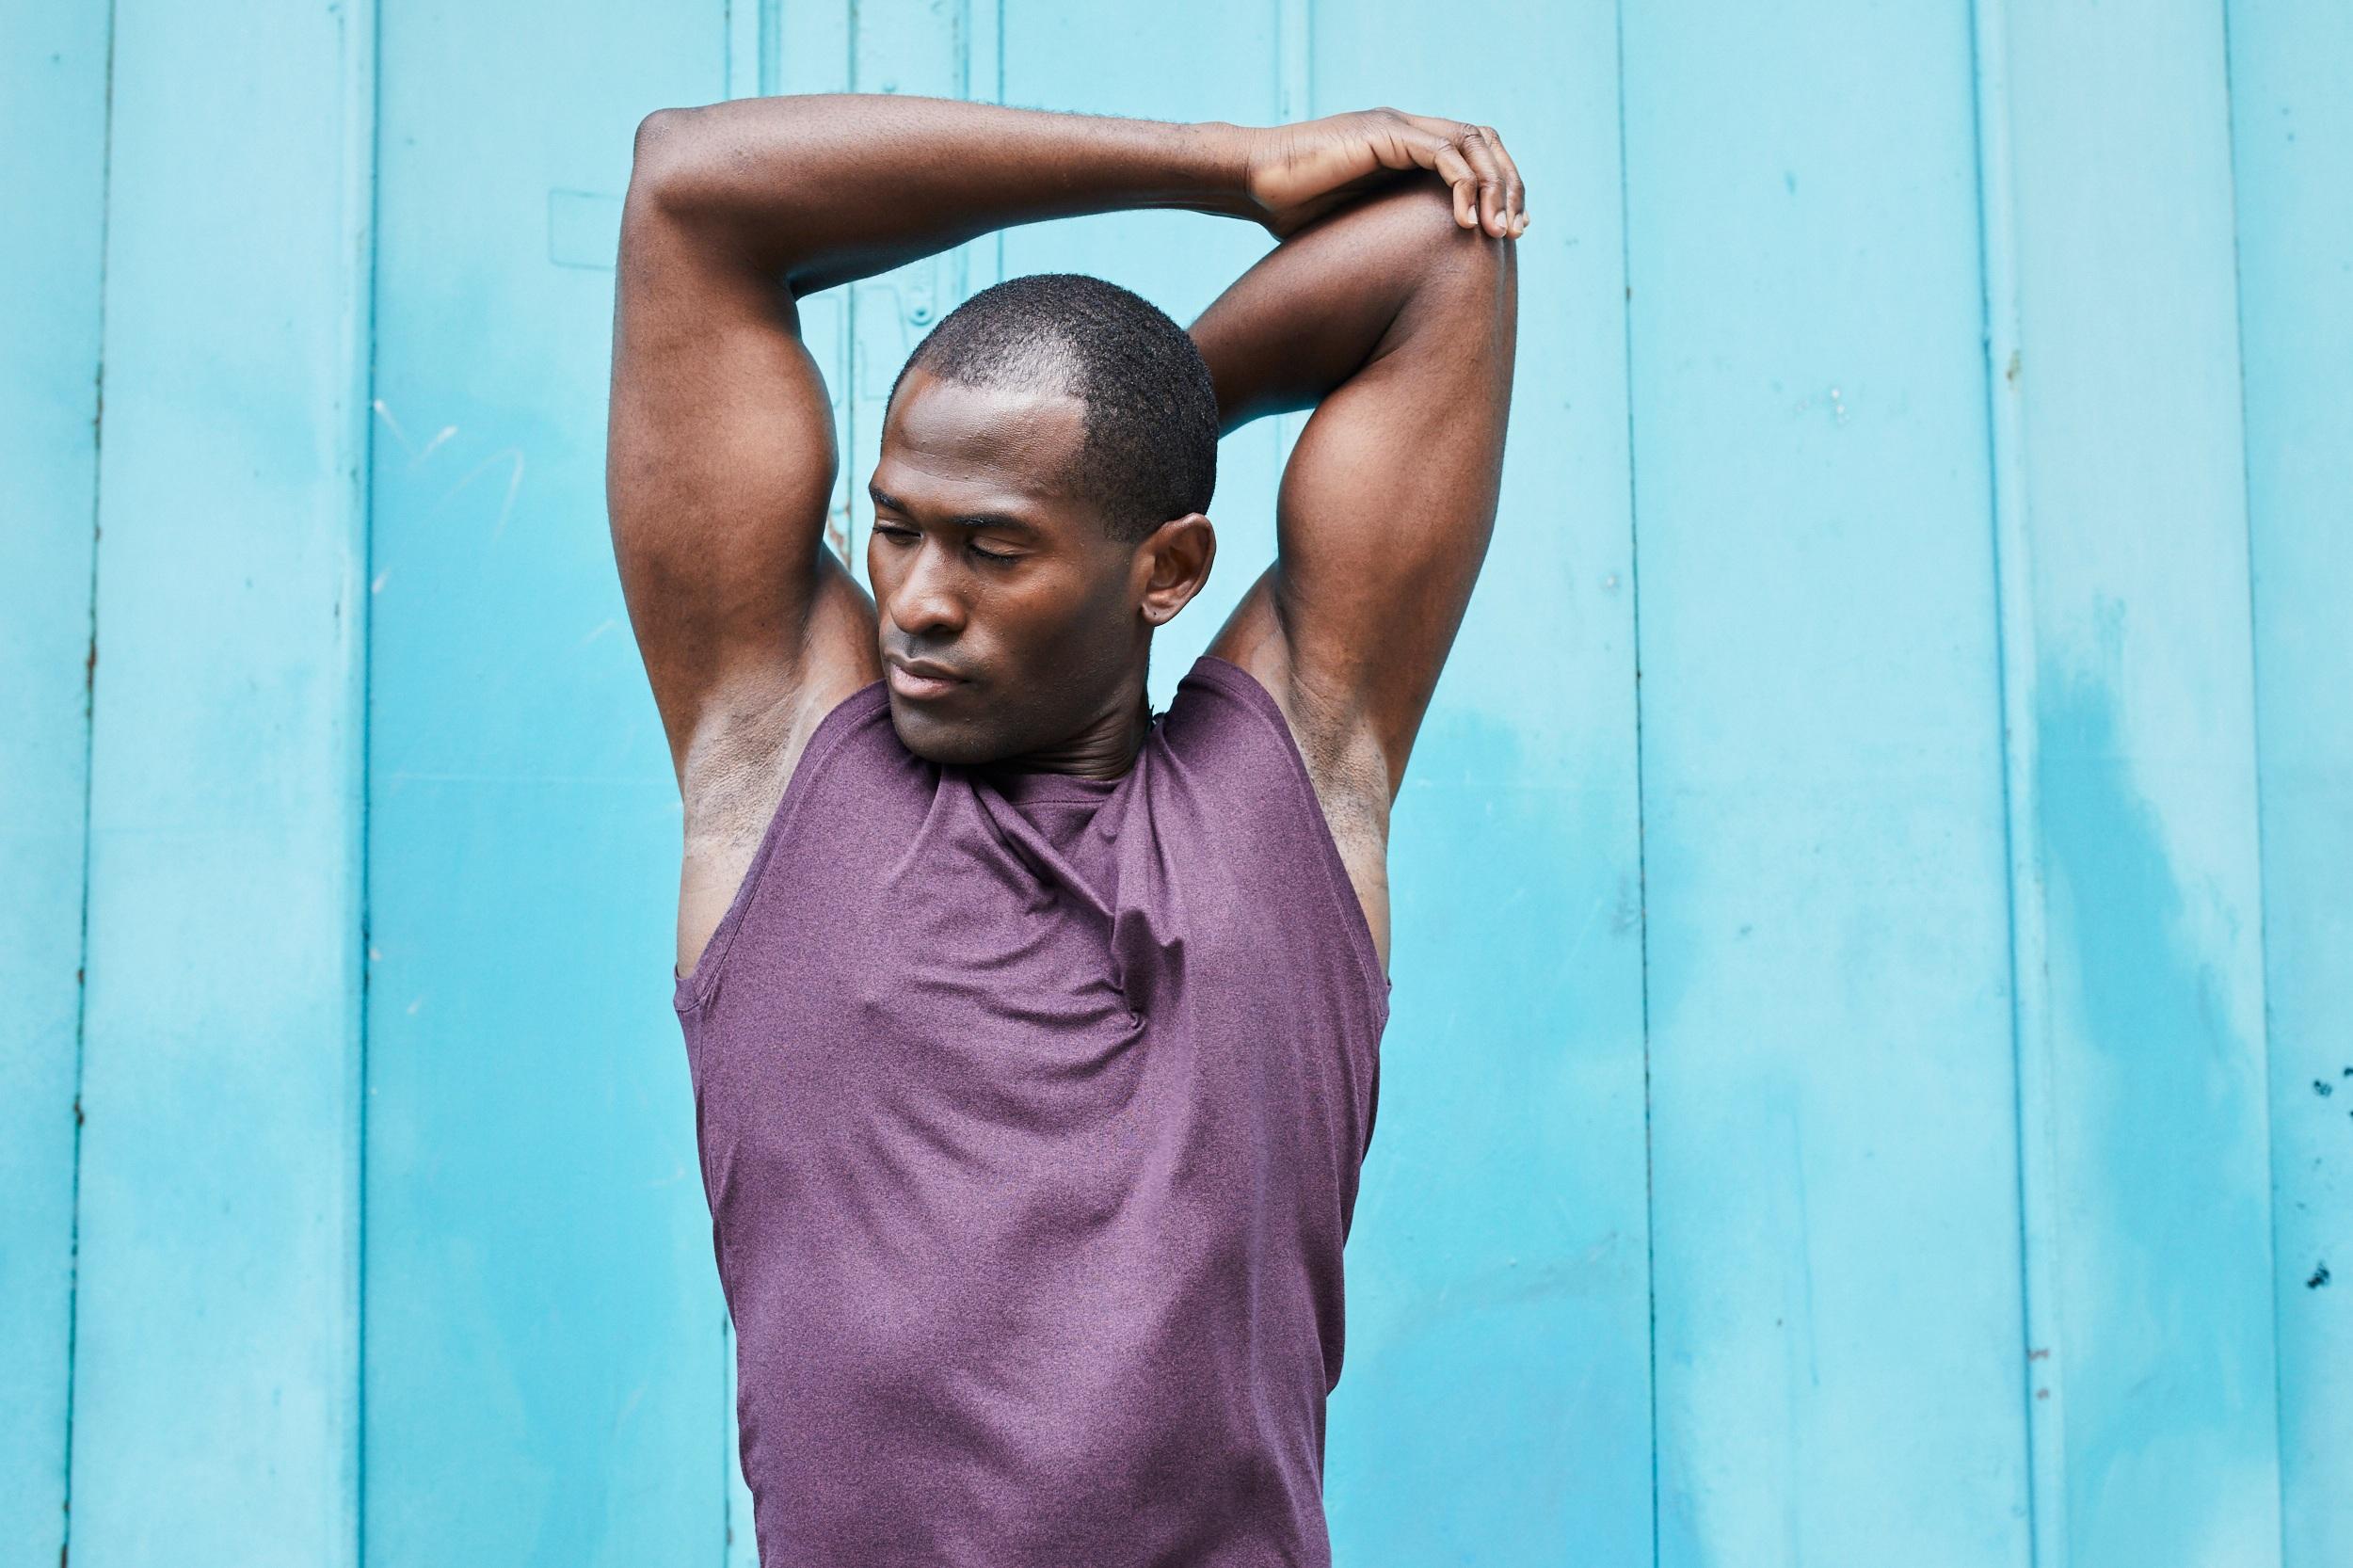 mens-fitness-gym-sports-apparel